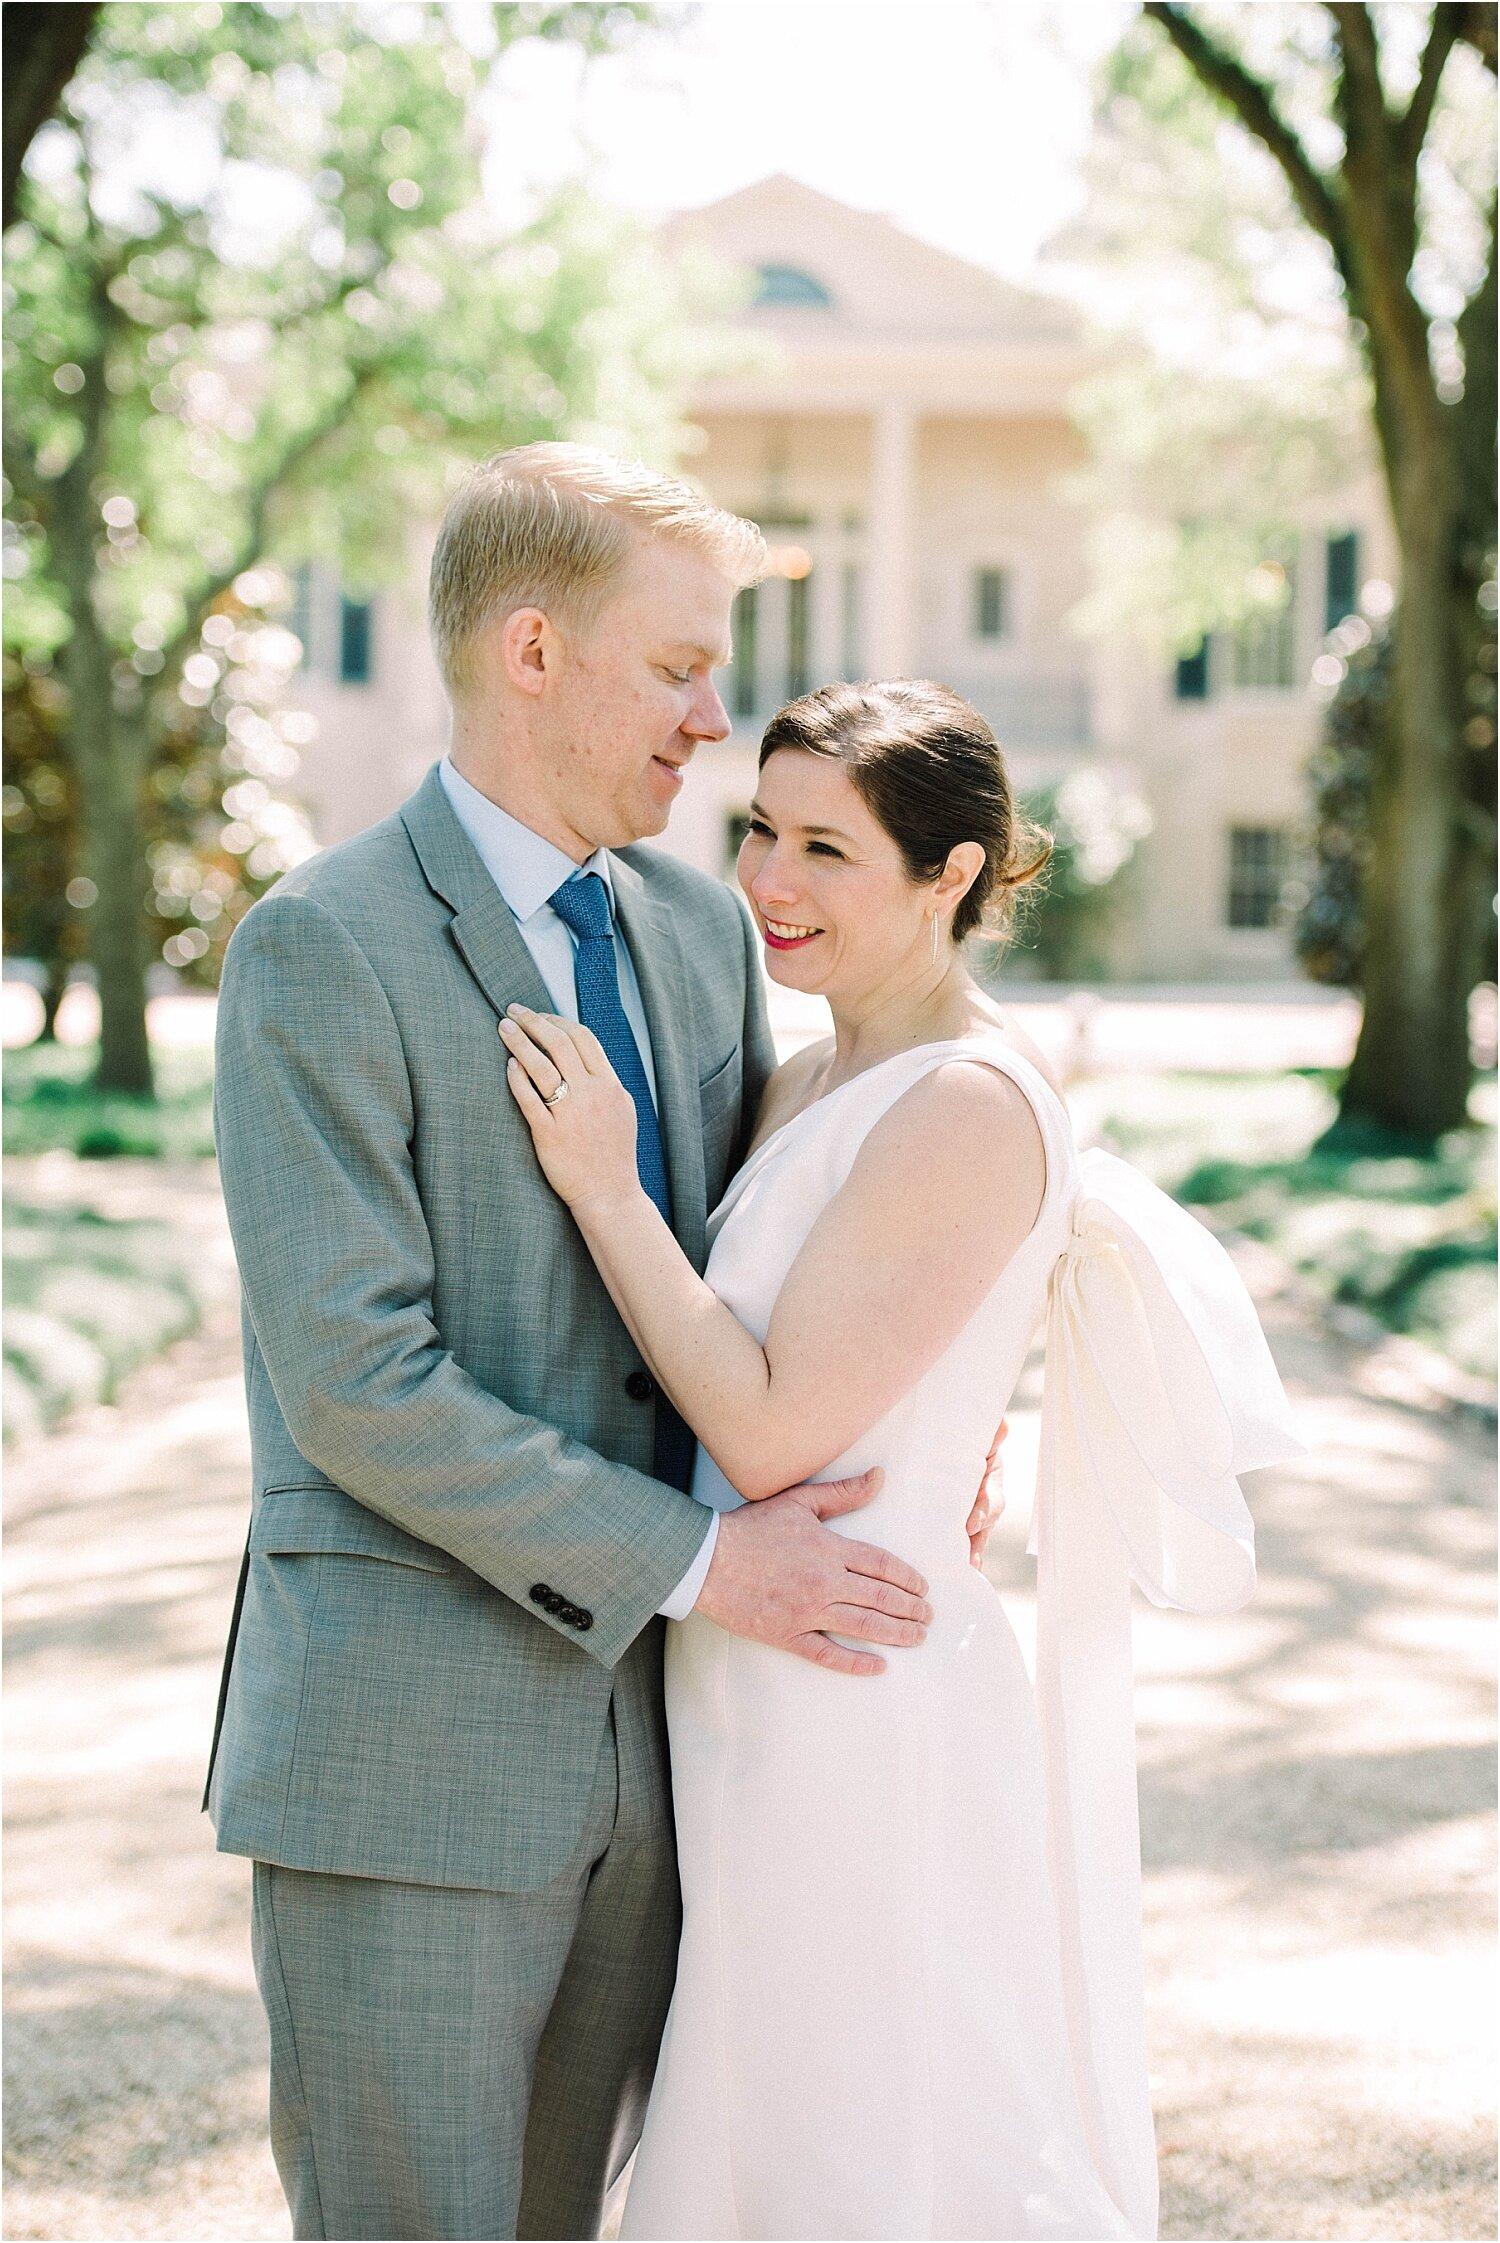 Heather + Scott-Longue-Vue-house-and-gardens-black-tie-wedding-photos_Gabby Chapin_Print_0041_BLOG.jpg